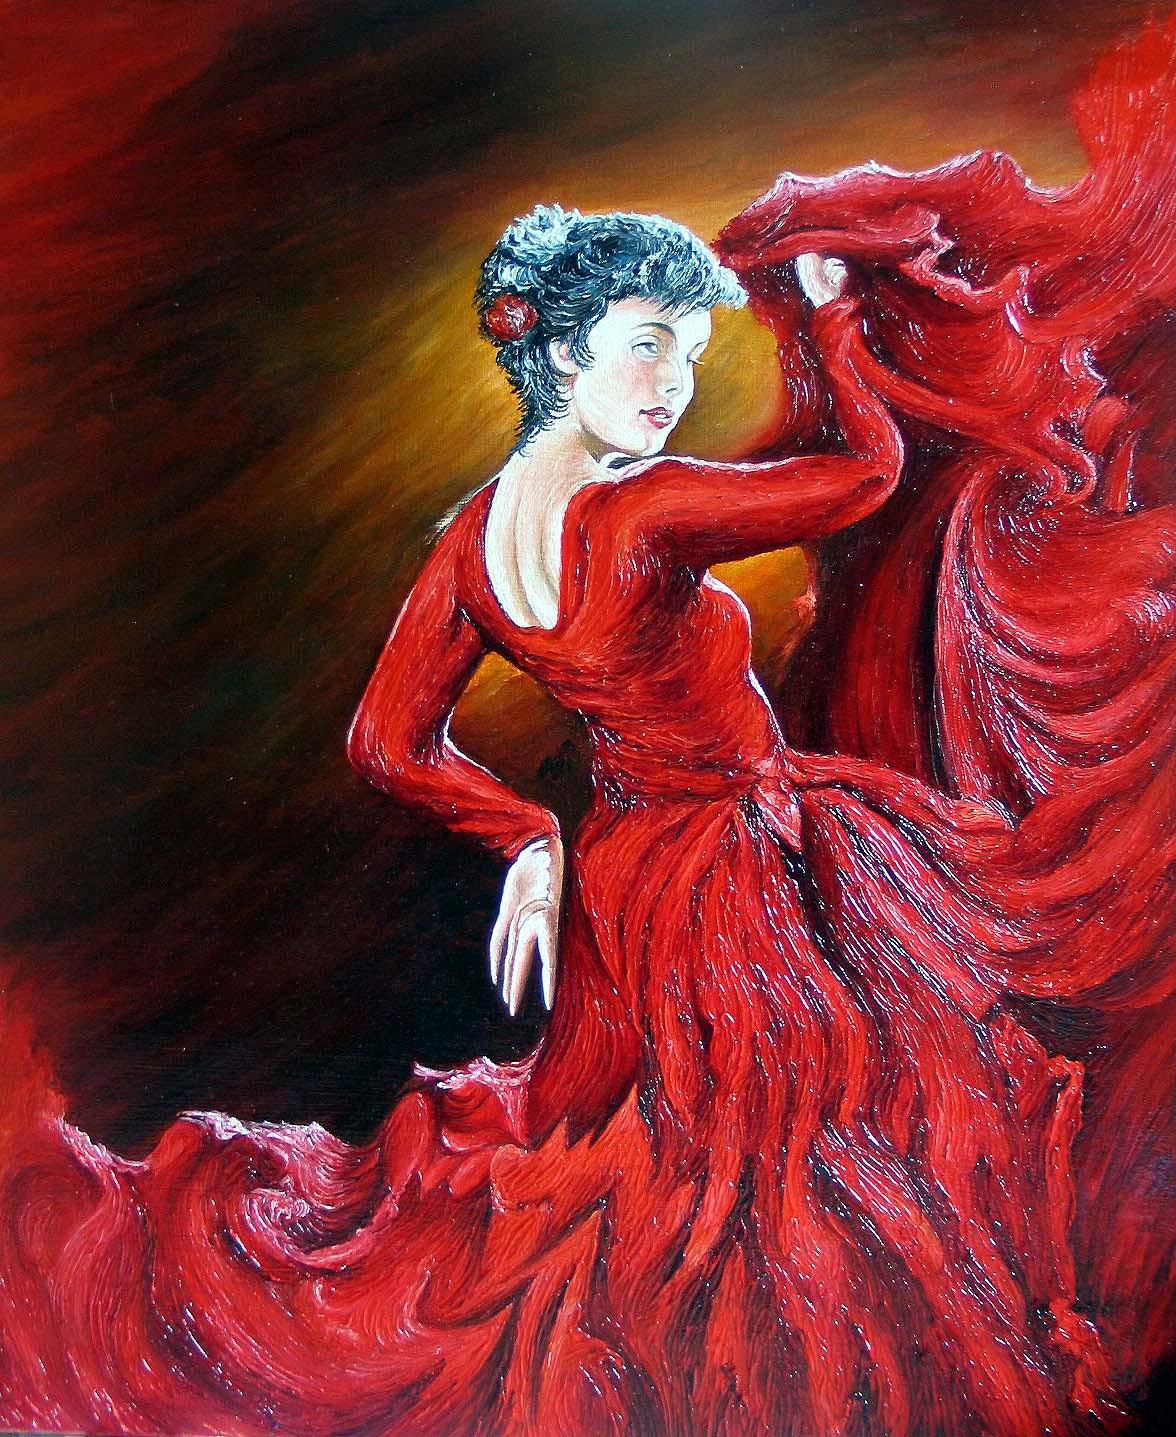 Pin andrew atroshenko on tumblr on pinterest - Peinture danseuse de flamenco ...